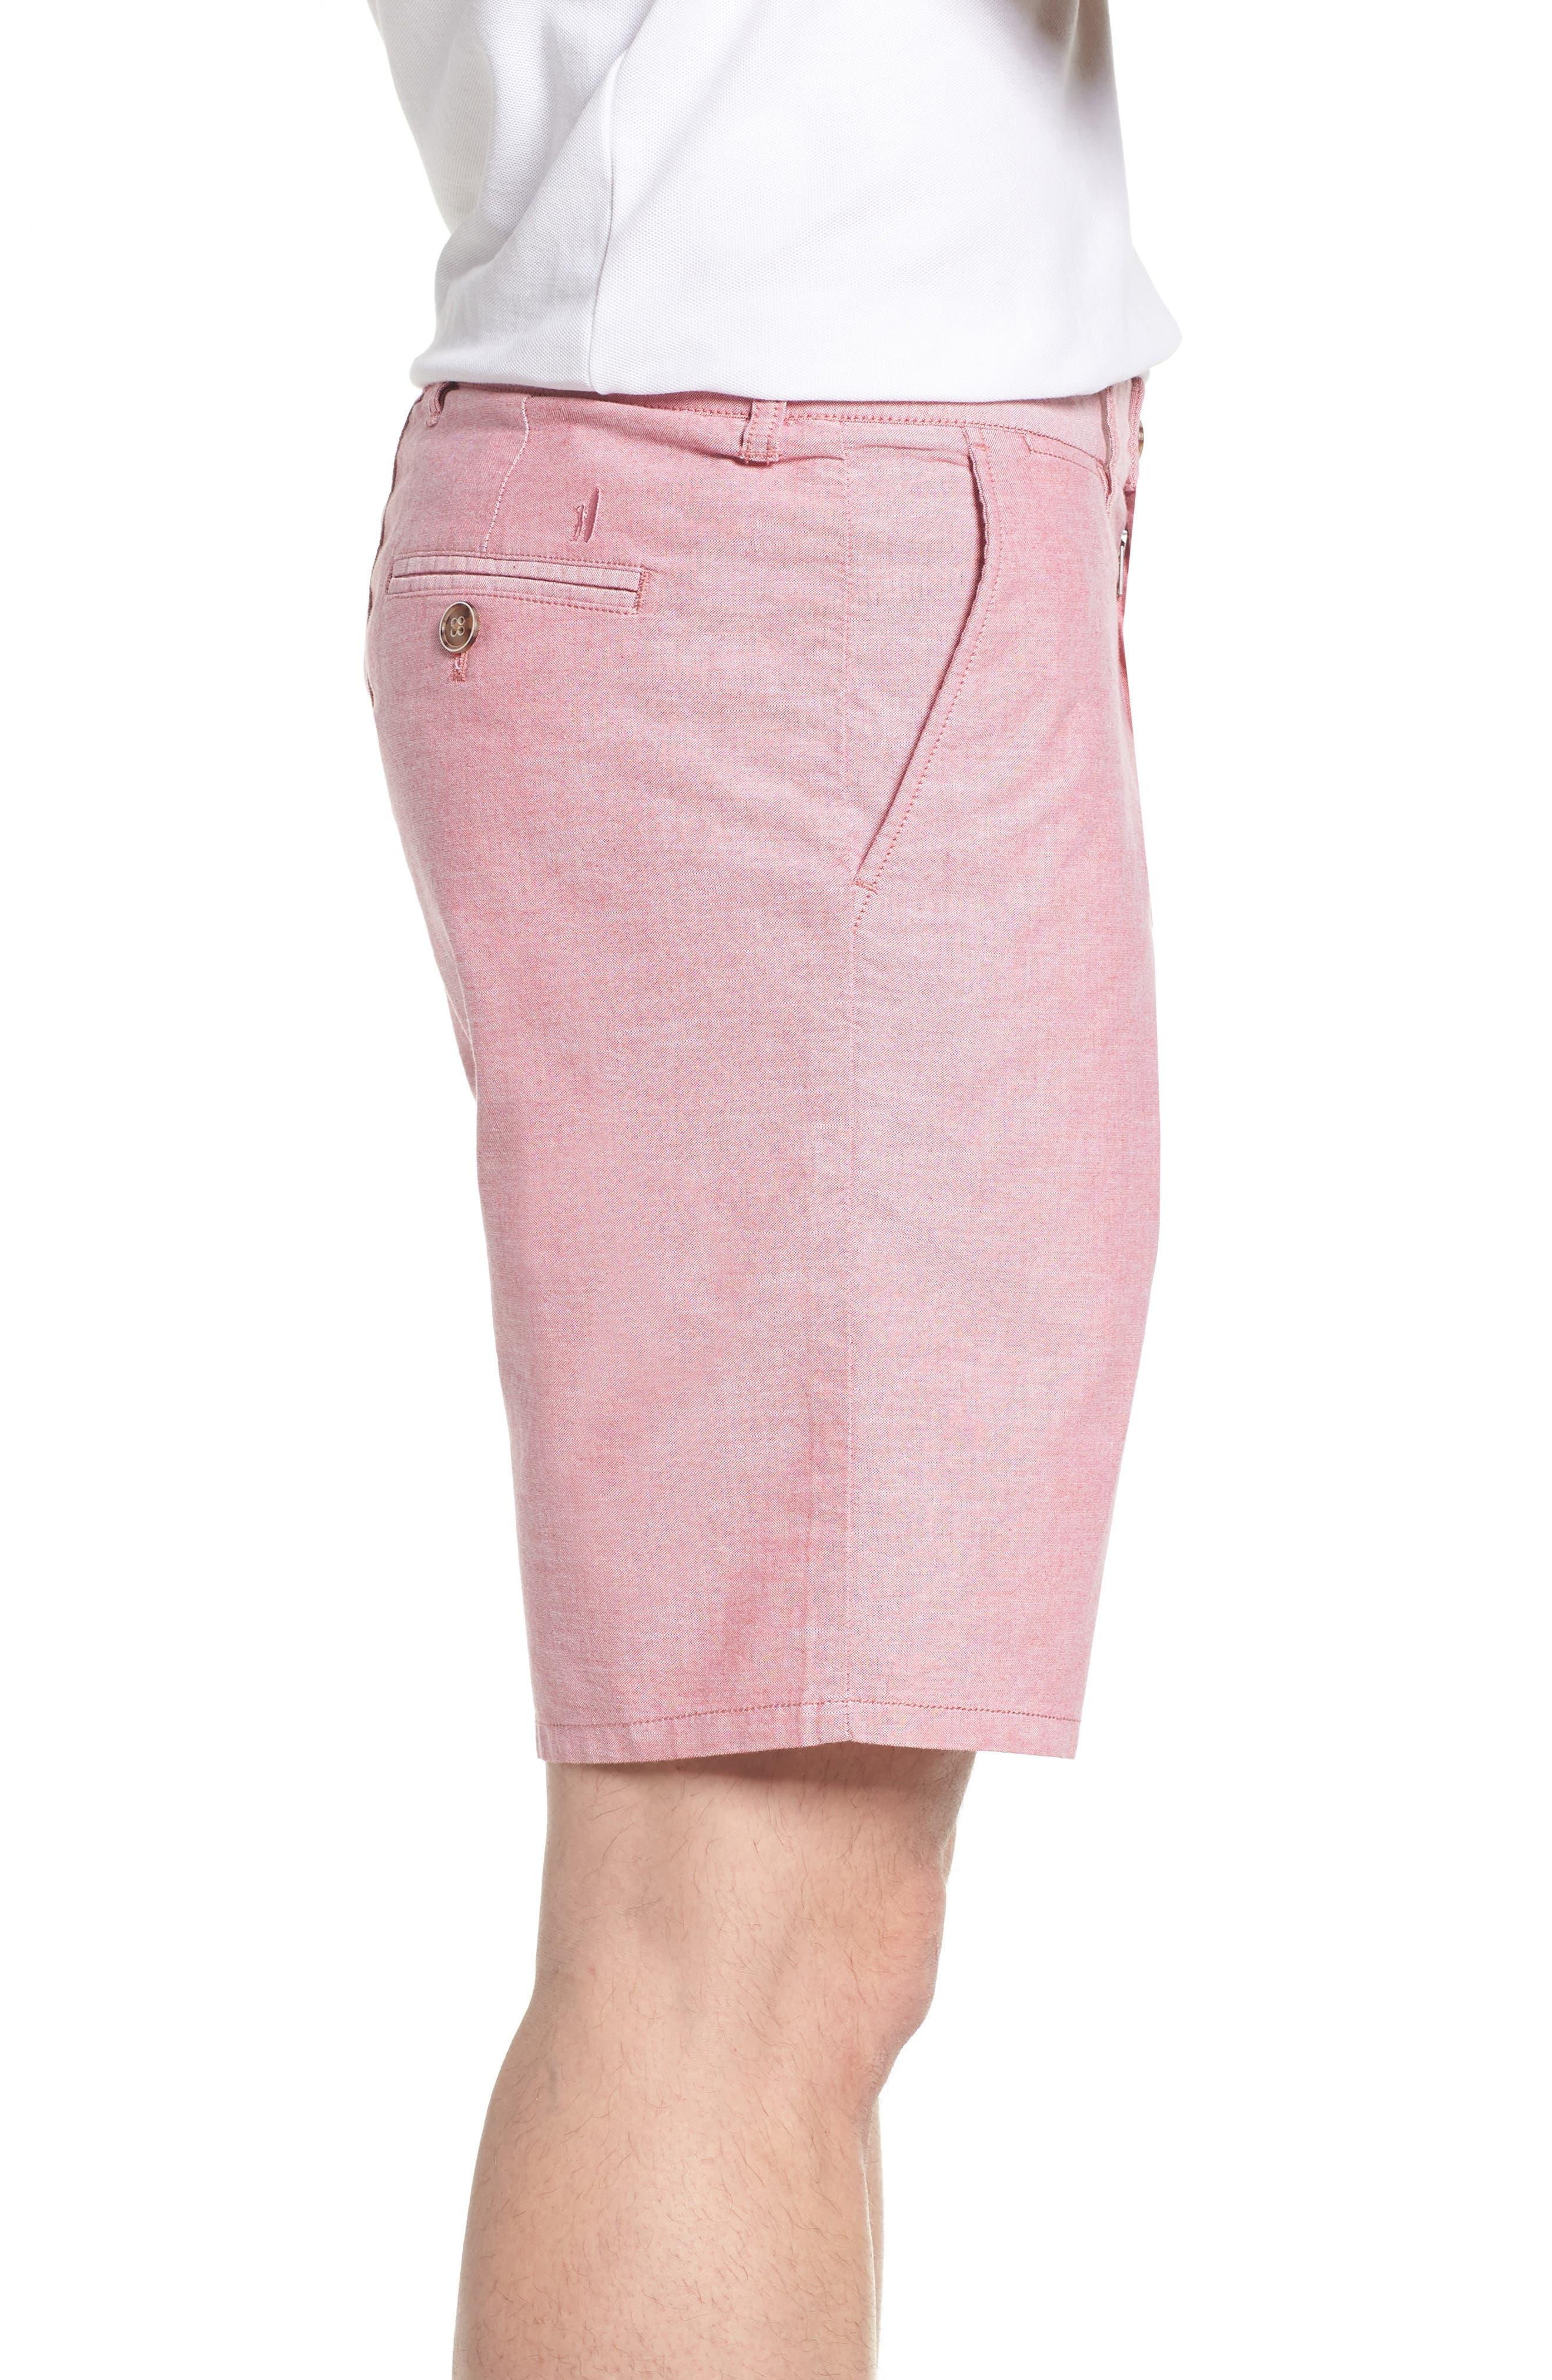 Merritt Regular Fit Shorts,                             Alternate thumbnail 3, color,                             Malibu Red